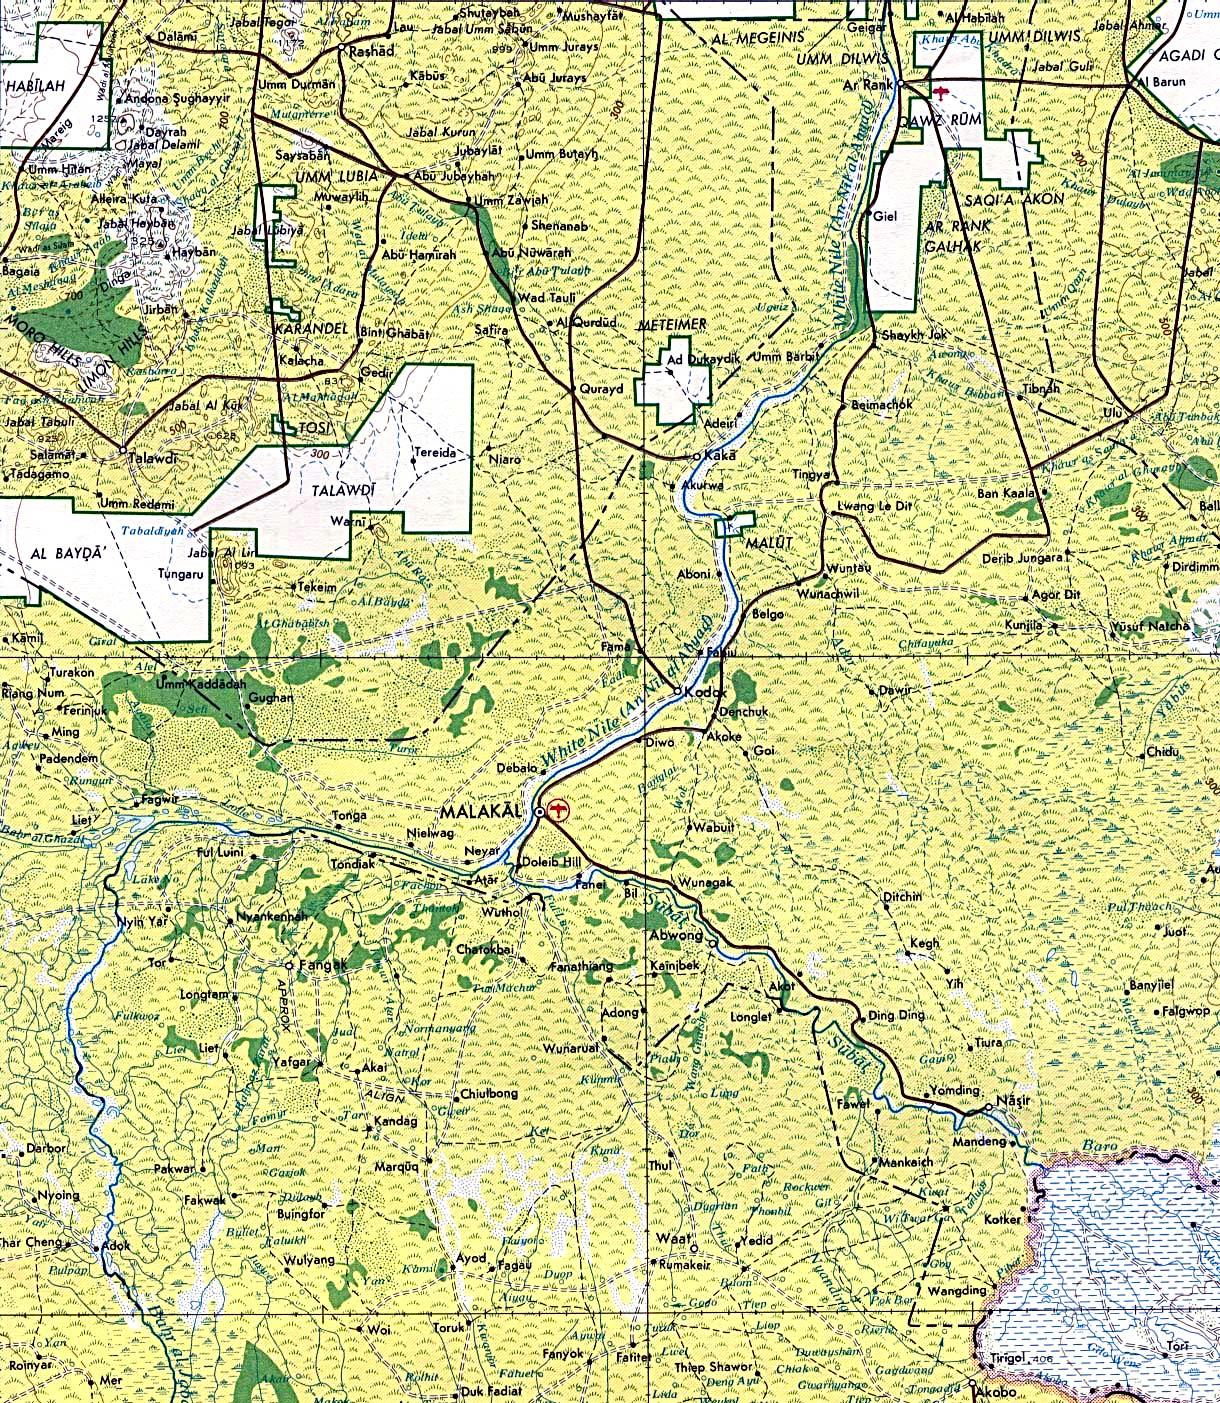 Of U S Army Map Service Series 2201 Sheet 20 1980 808k